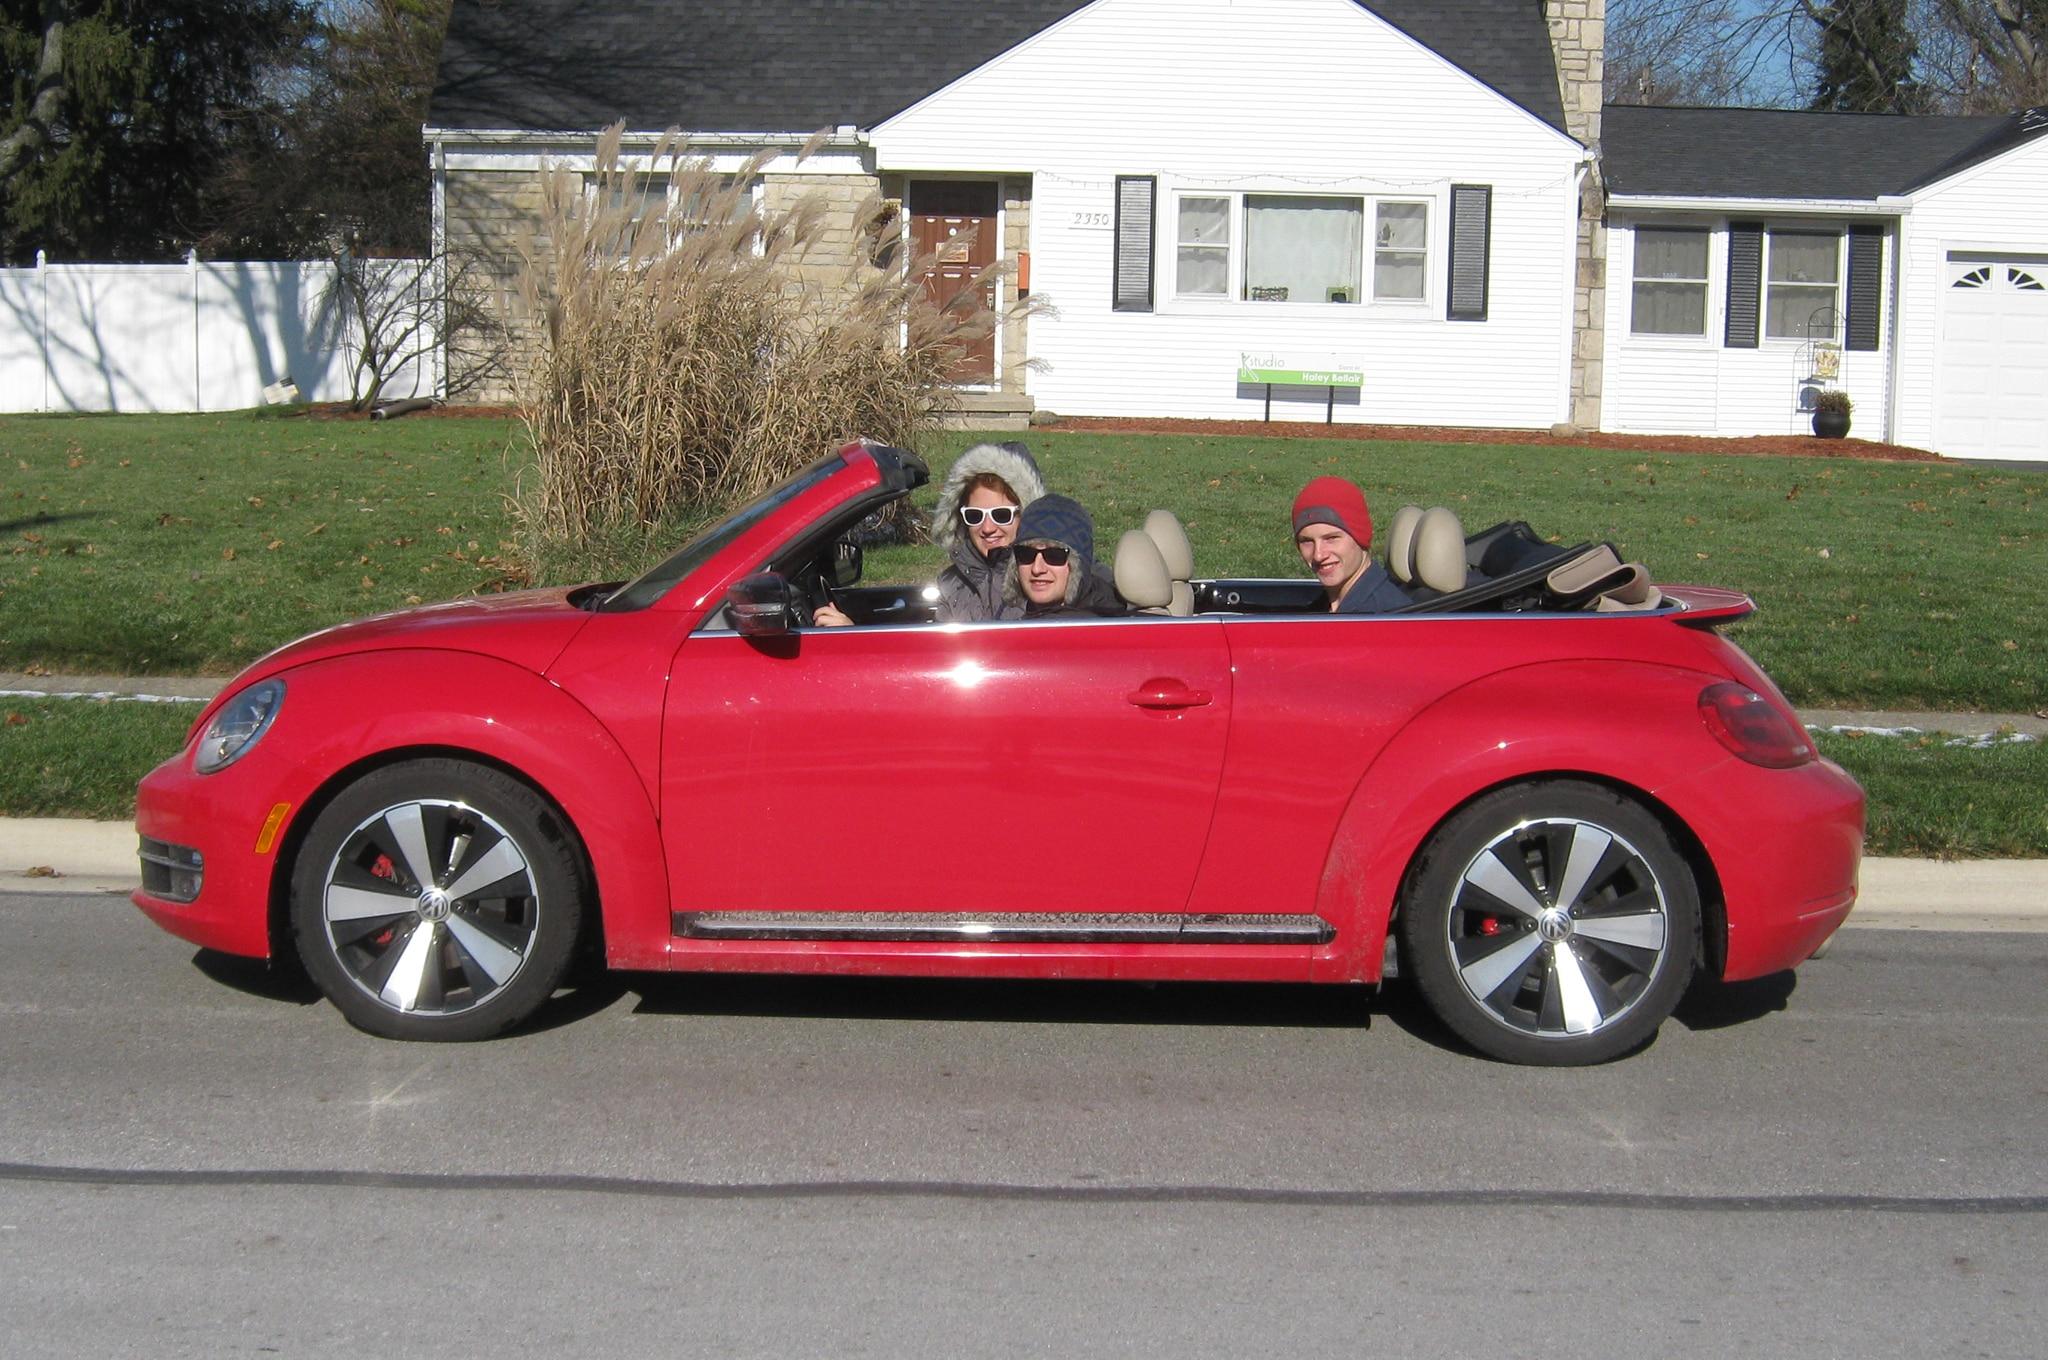 Vw Beetle Convertible >> 2013 Volkswagen Beetle Turbo Convertible - Four Seasons